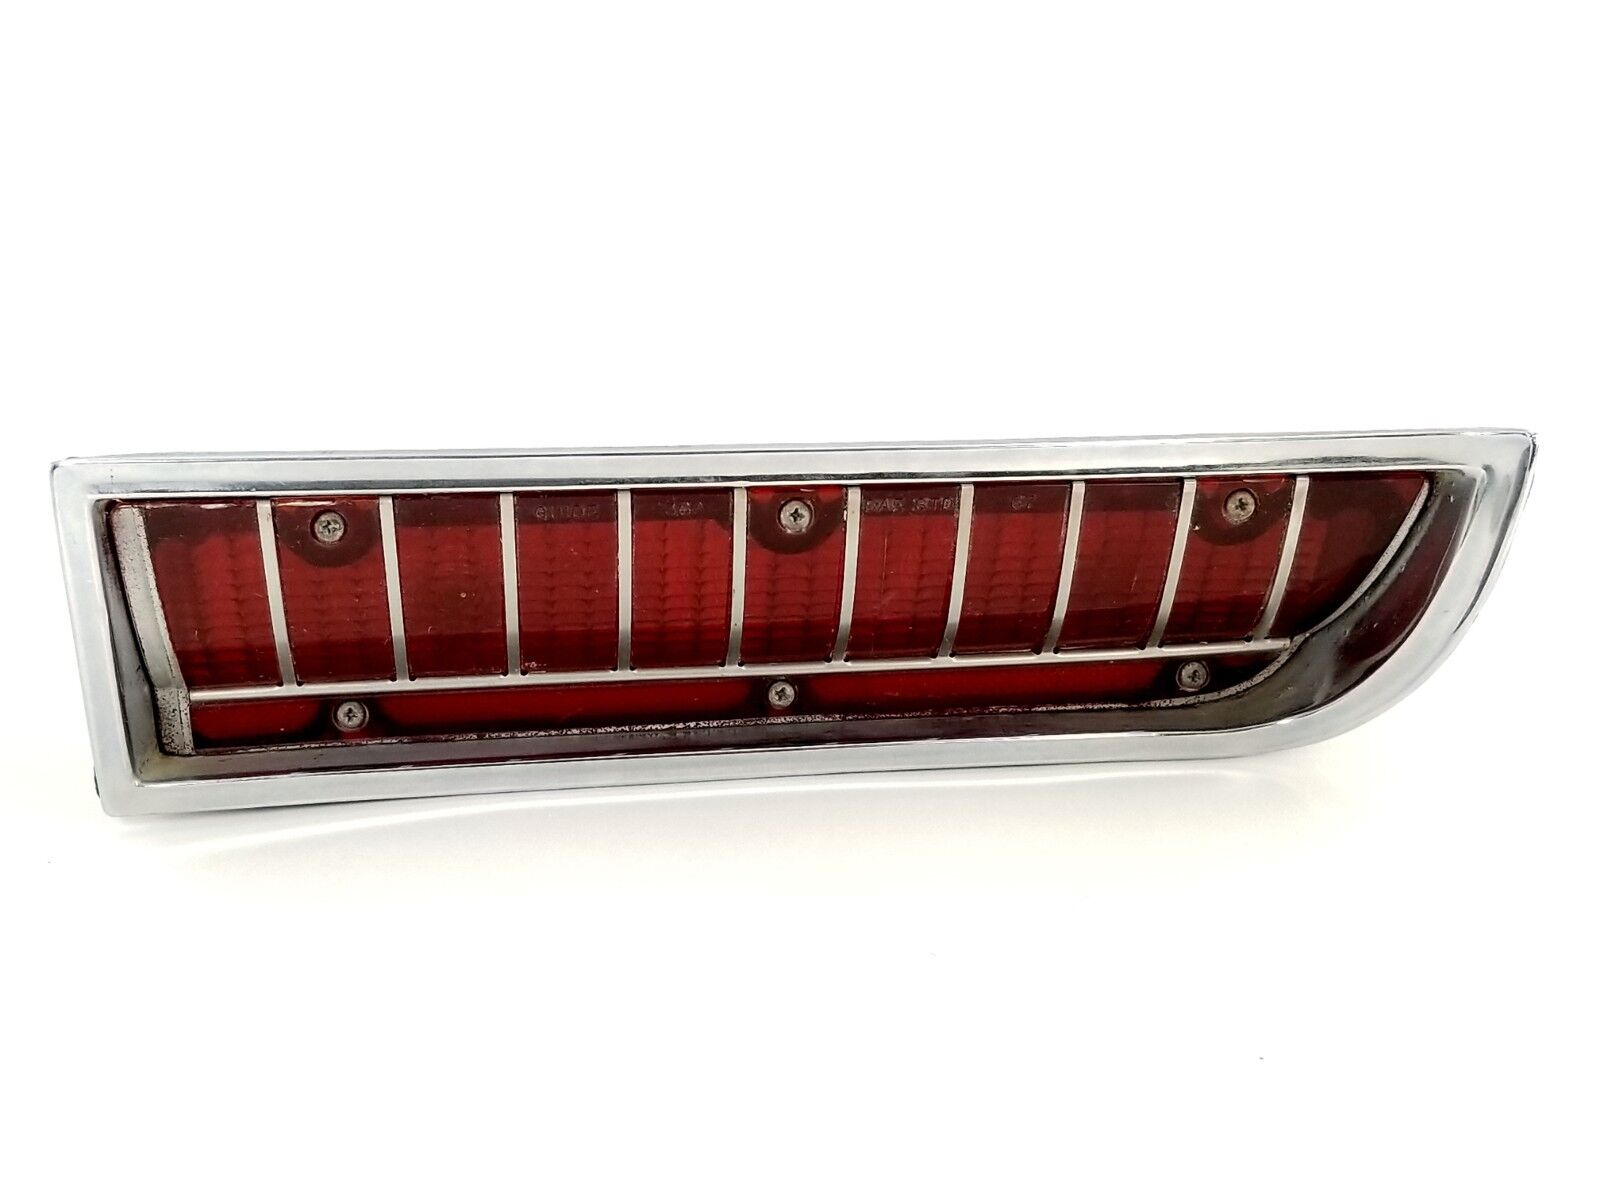 1967 Oldsmobile Super Delta 88 Lower RH Bumper Tail Light Assembly 36A STDB T142